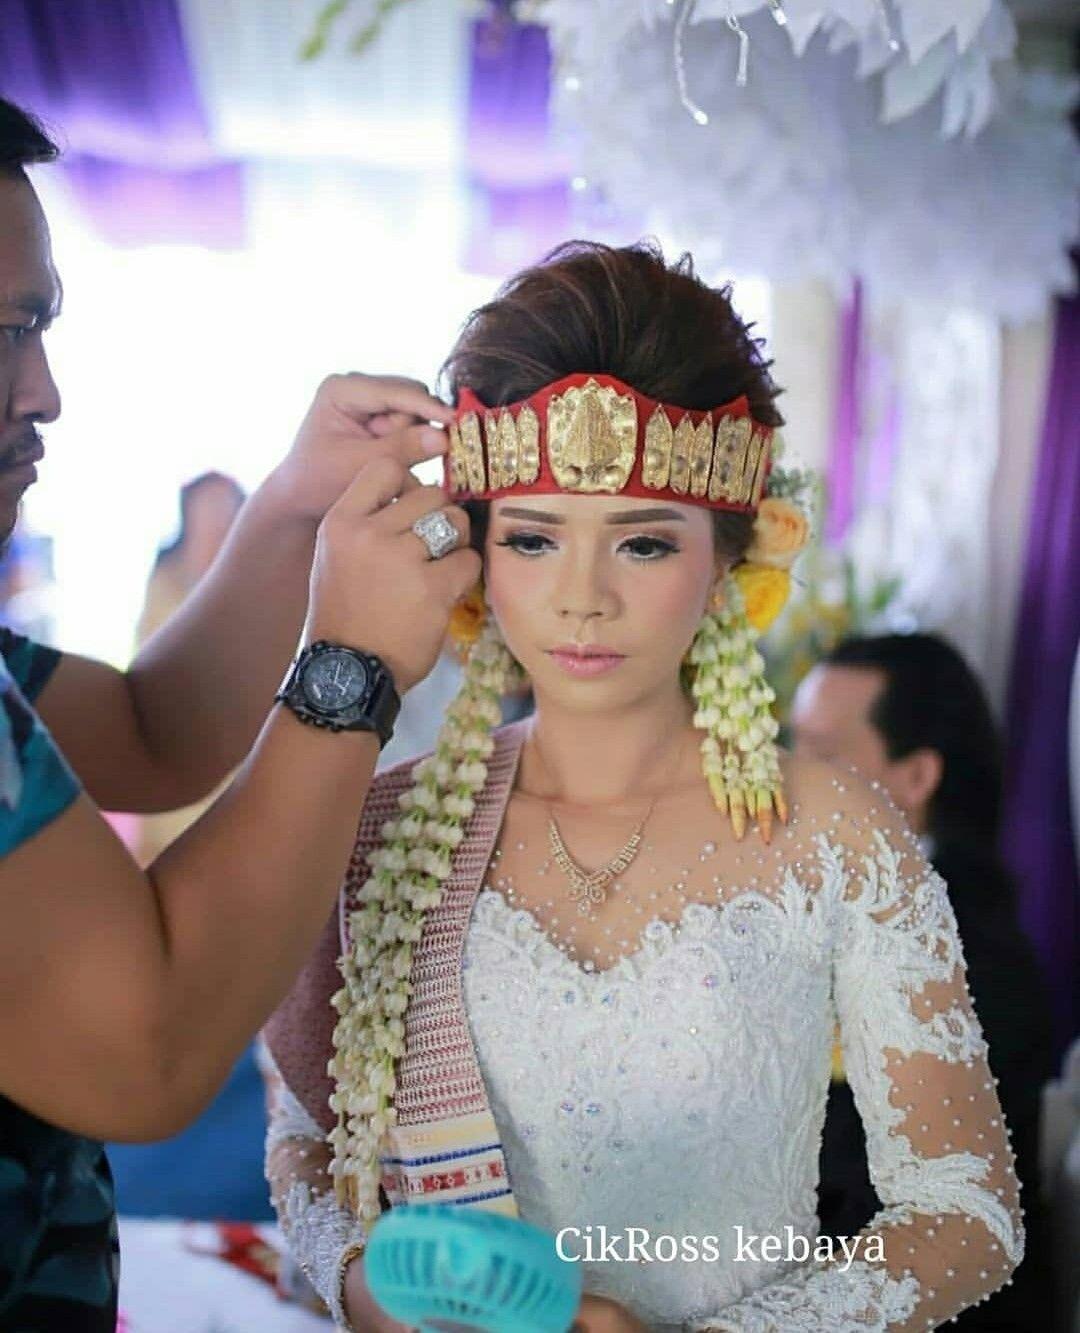 CikRoss Kebaya Kebaya pengantin batak  Kebaya pernikahan